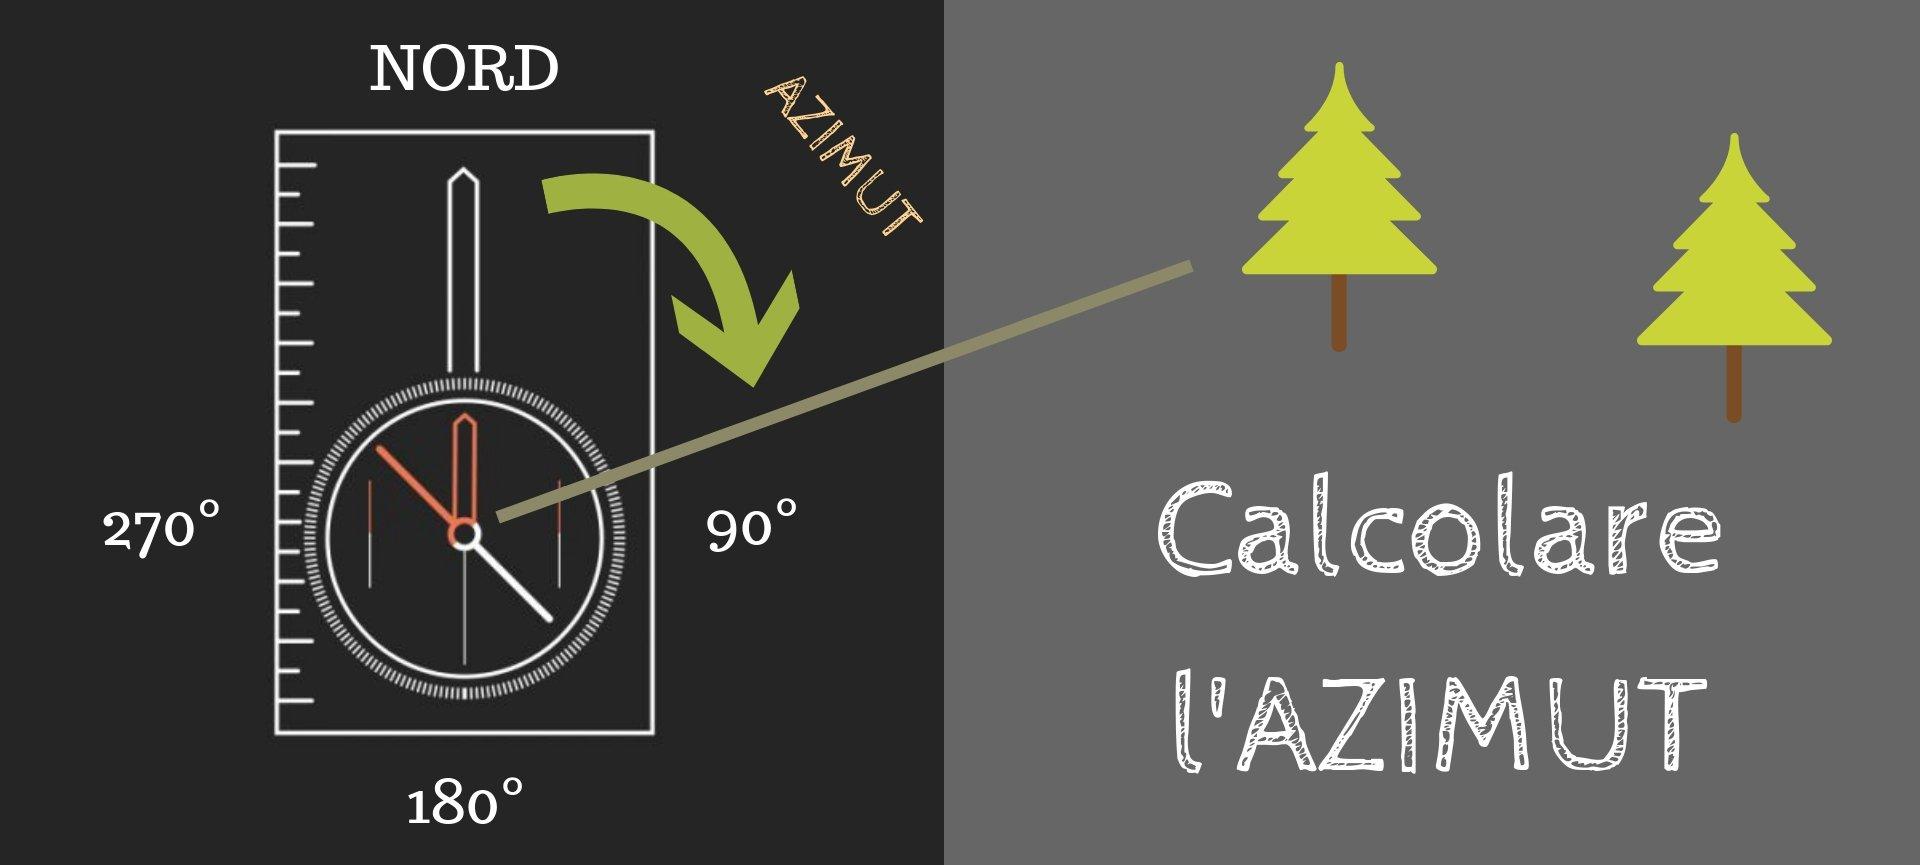 Bussola: calcolare l'azimut